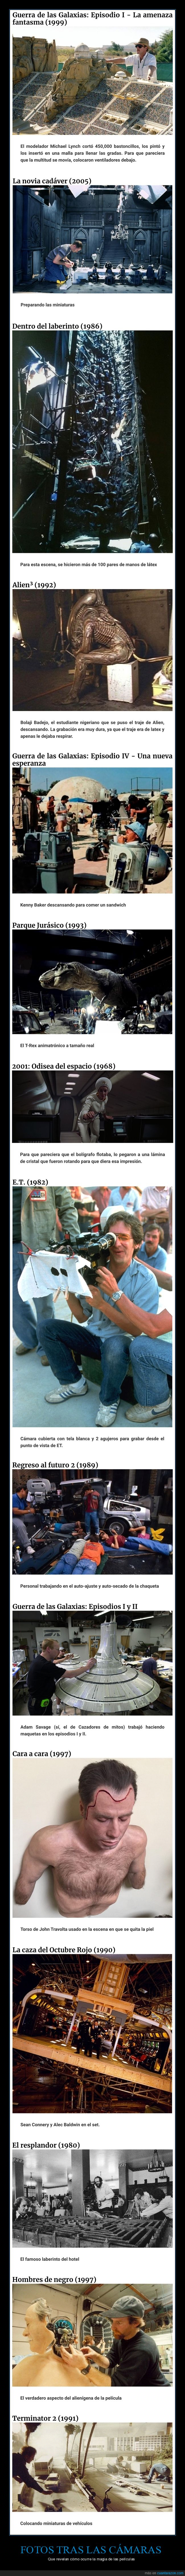 cine,curiosidades,detrás de las cámaras,películas